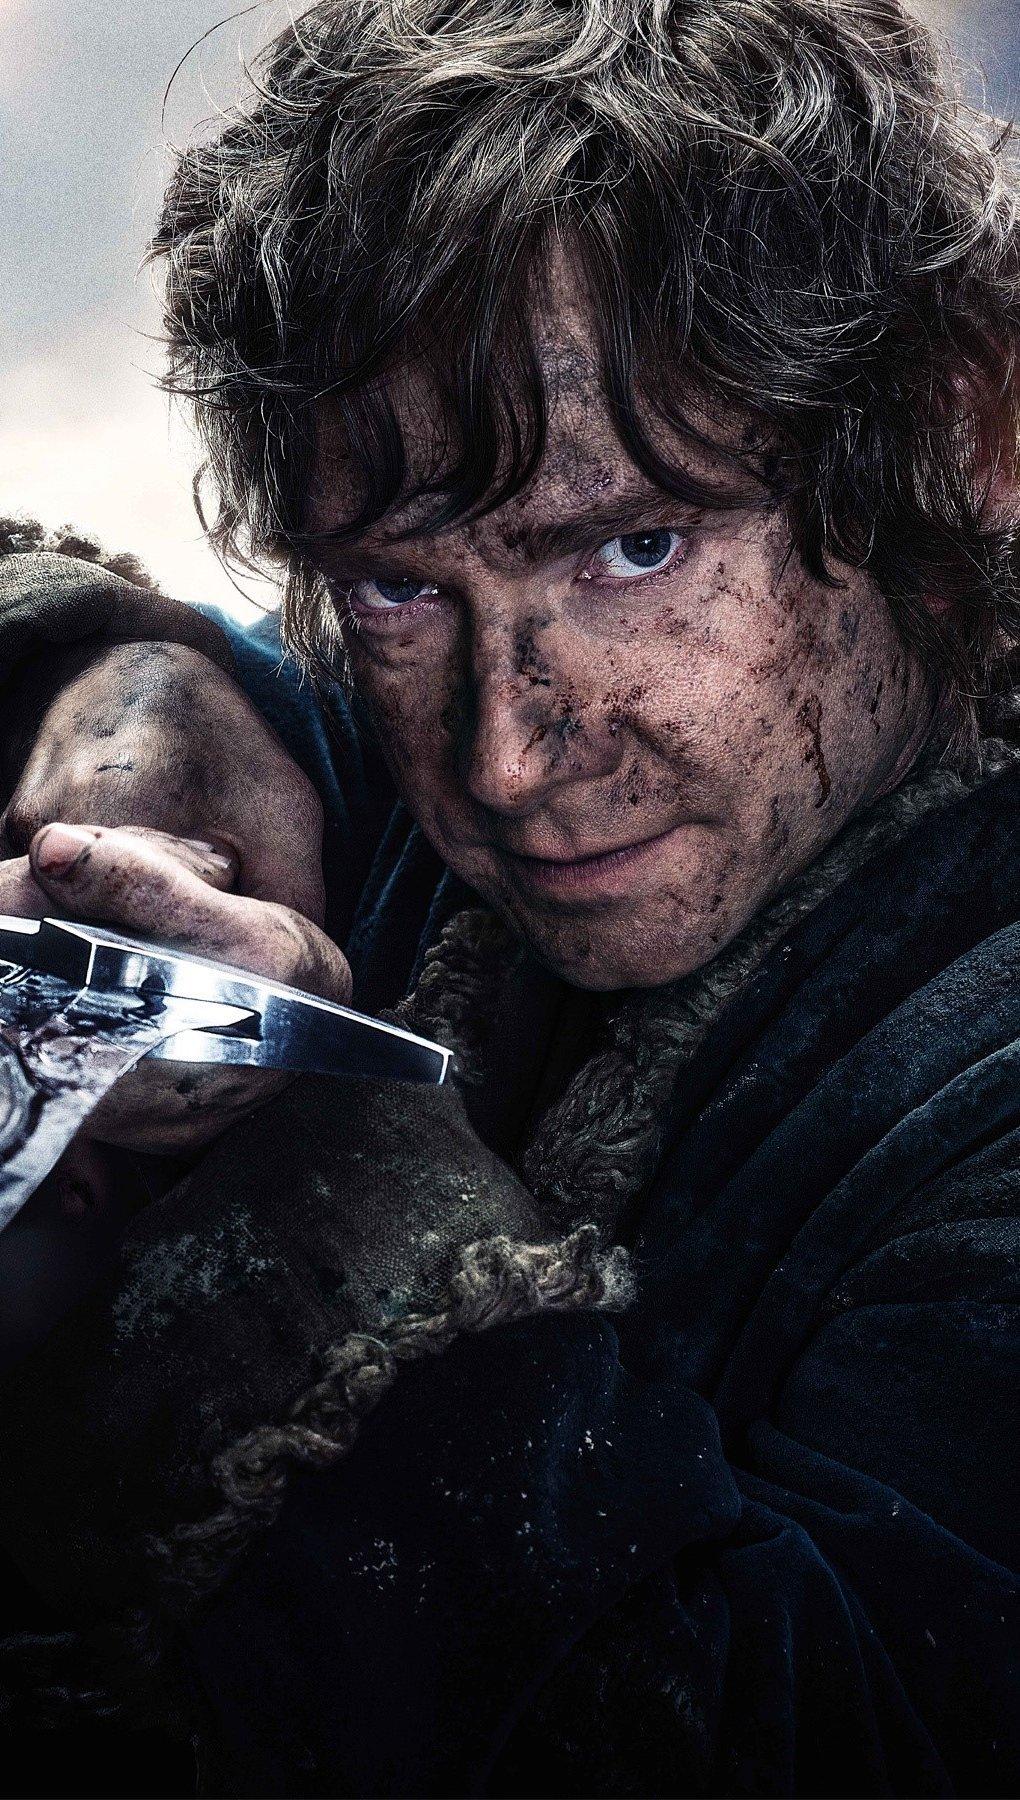 Fondos de pantalla Bilbo Baggins en El Hobbit 3 Vertical